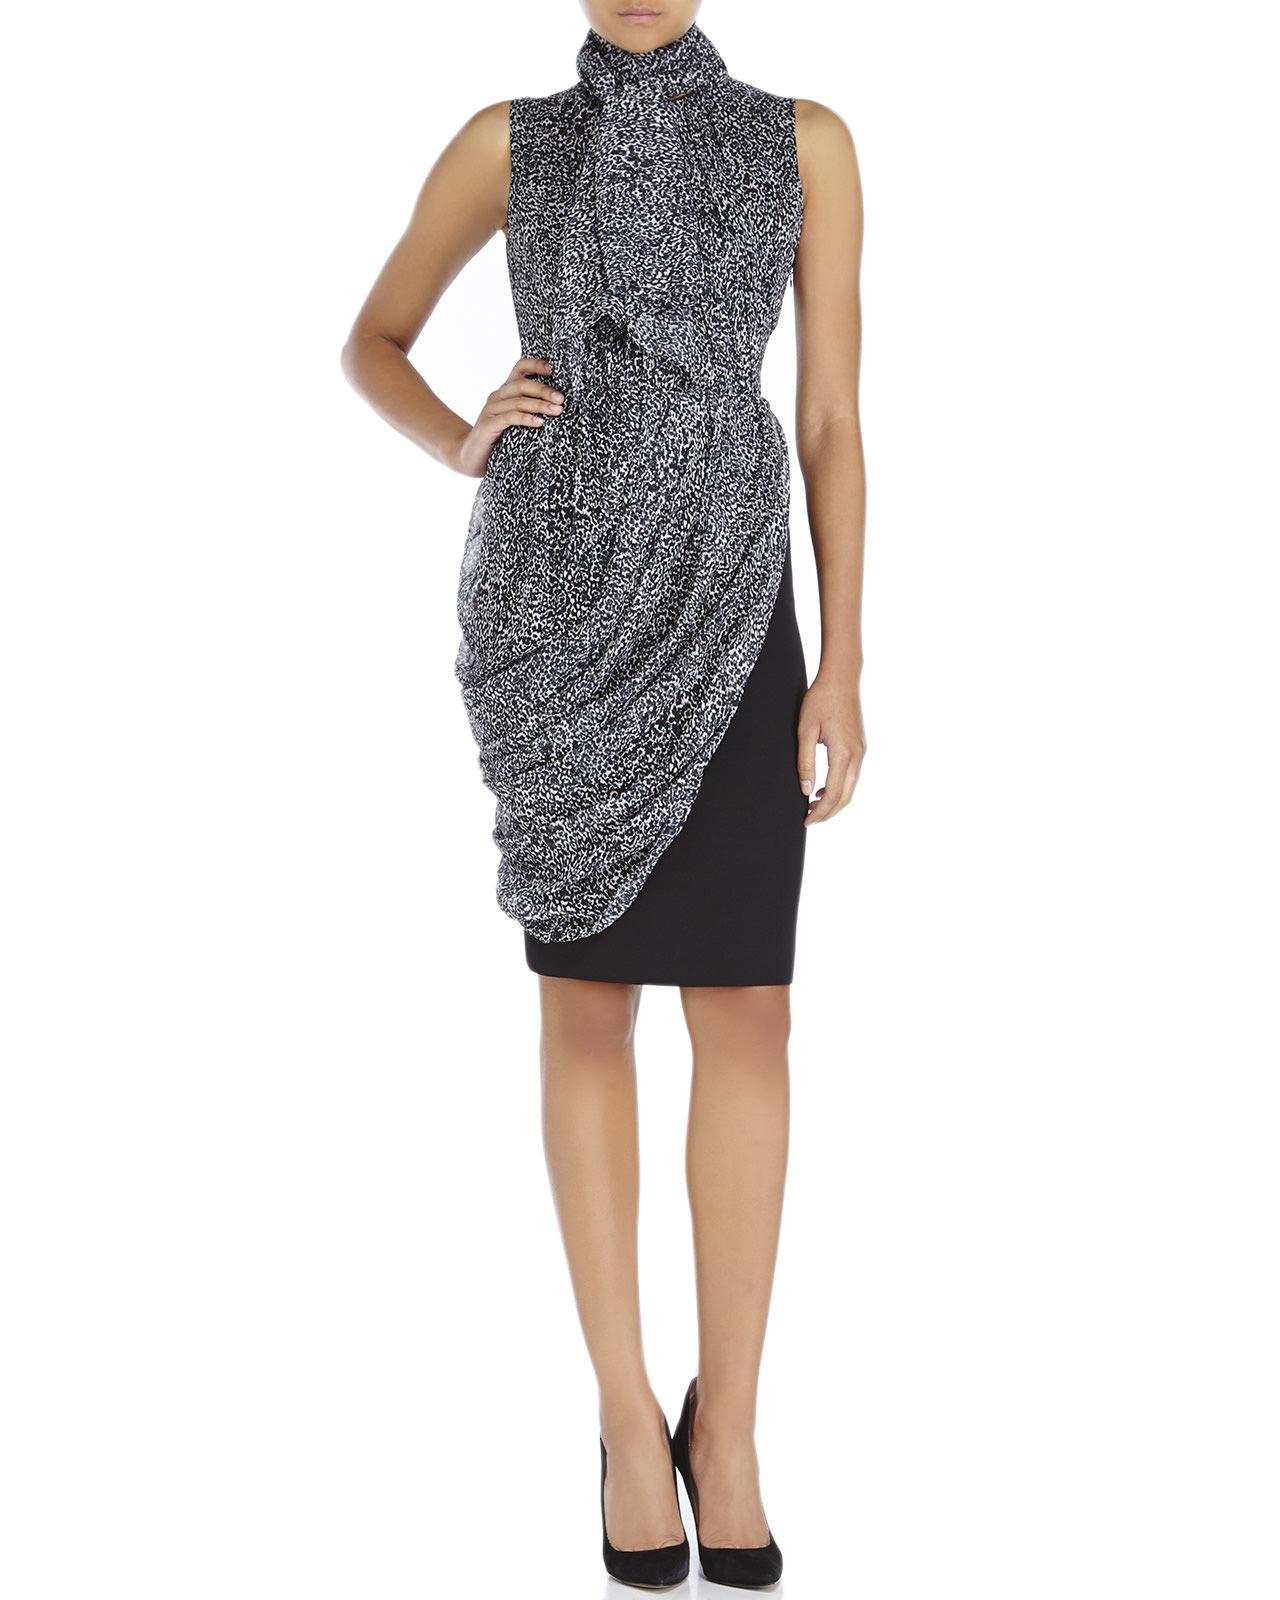 5925a7dd1b Lyst - Giambattista Valli Animal Print Scarf Dress in Black